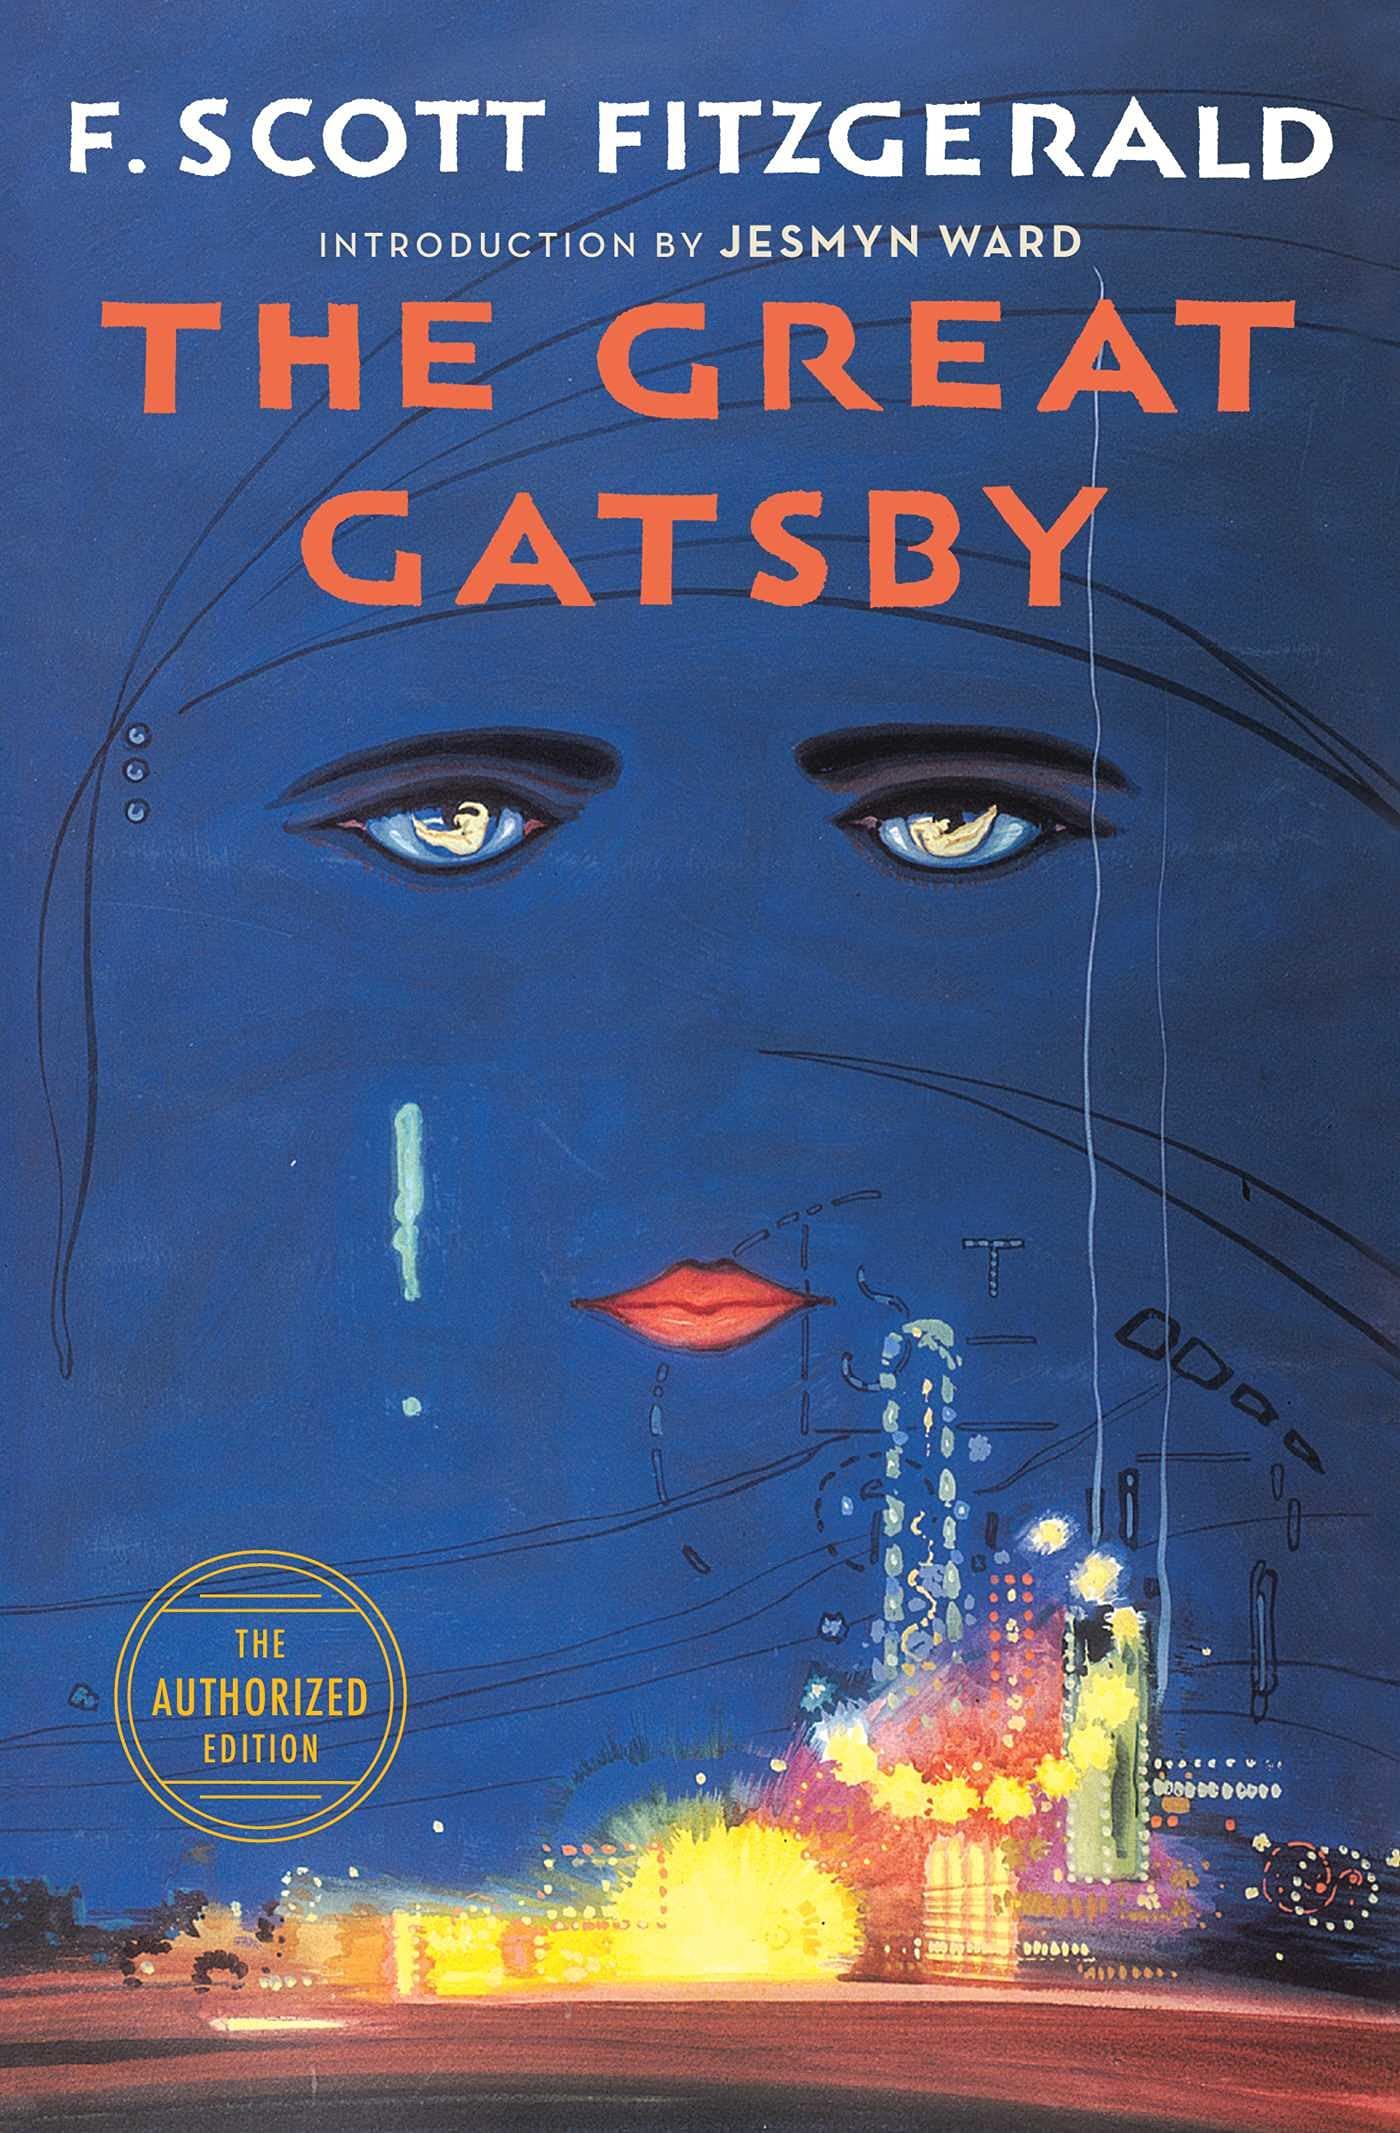 Amazon.com: The Great Gatsby: 9780743273565: Fitzgerald, F. Scott: Books